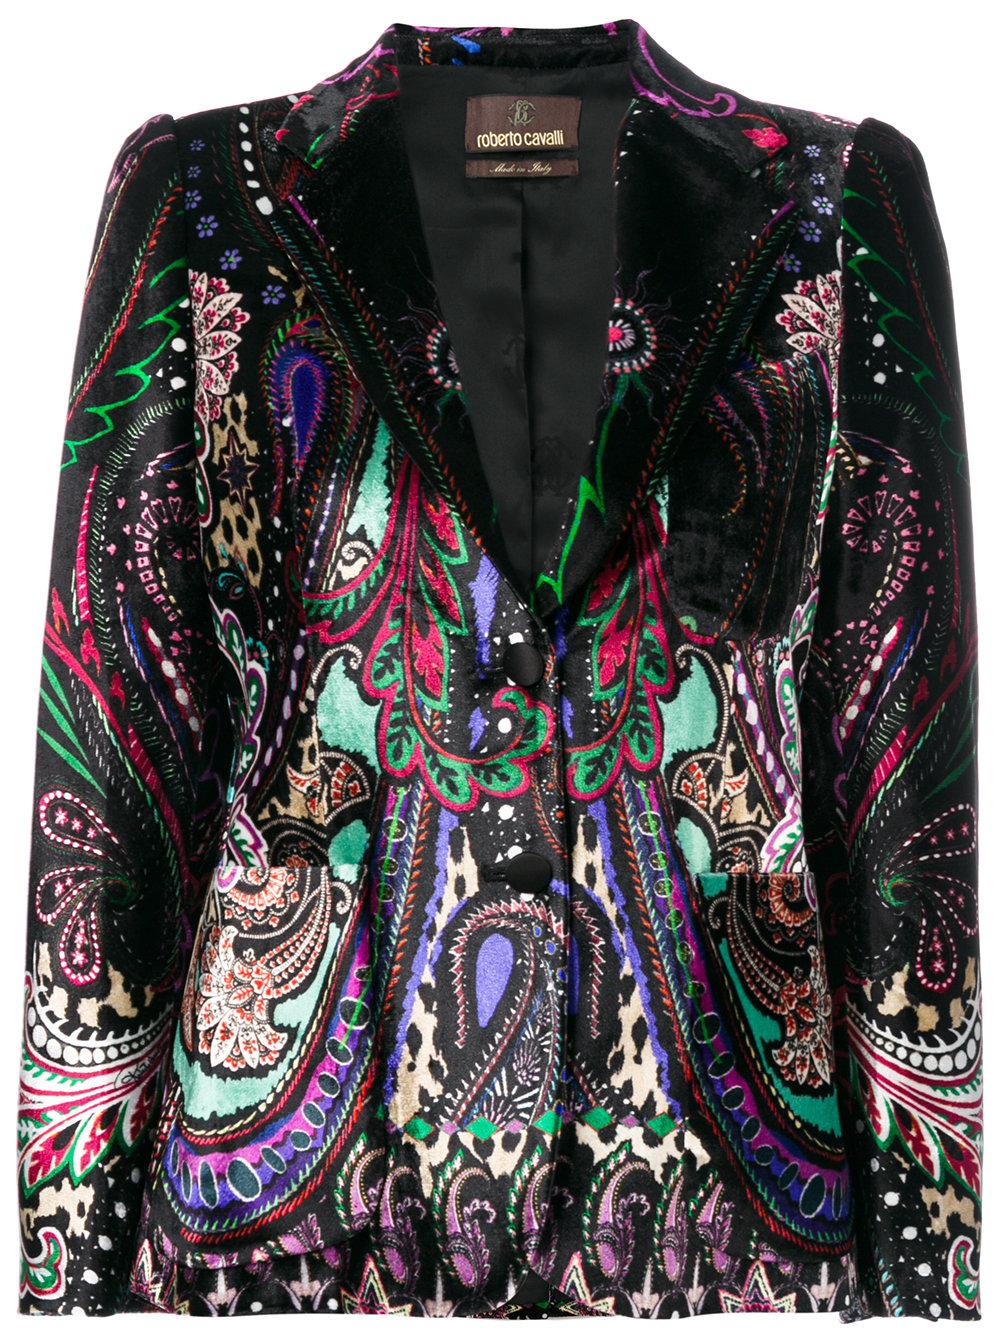 ROBERTO CAVALLI jacket - $1,910